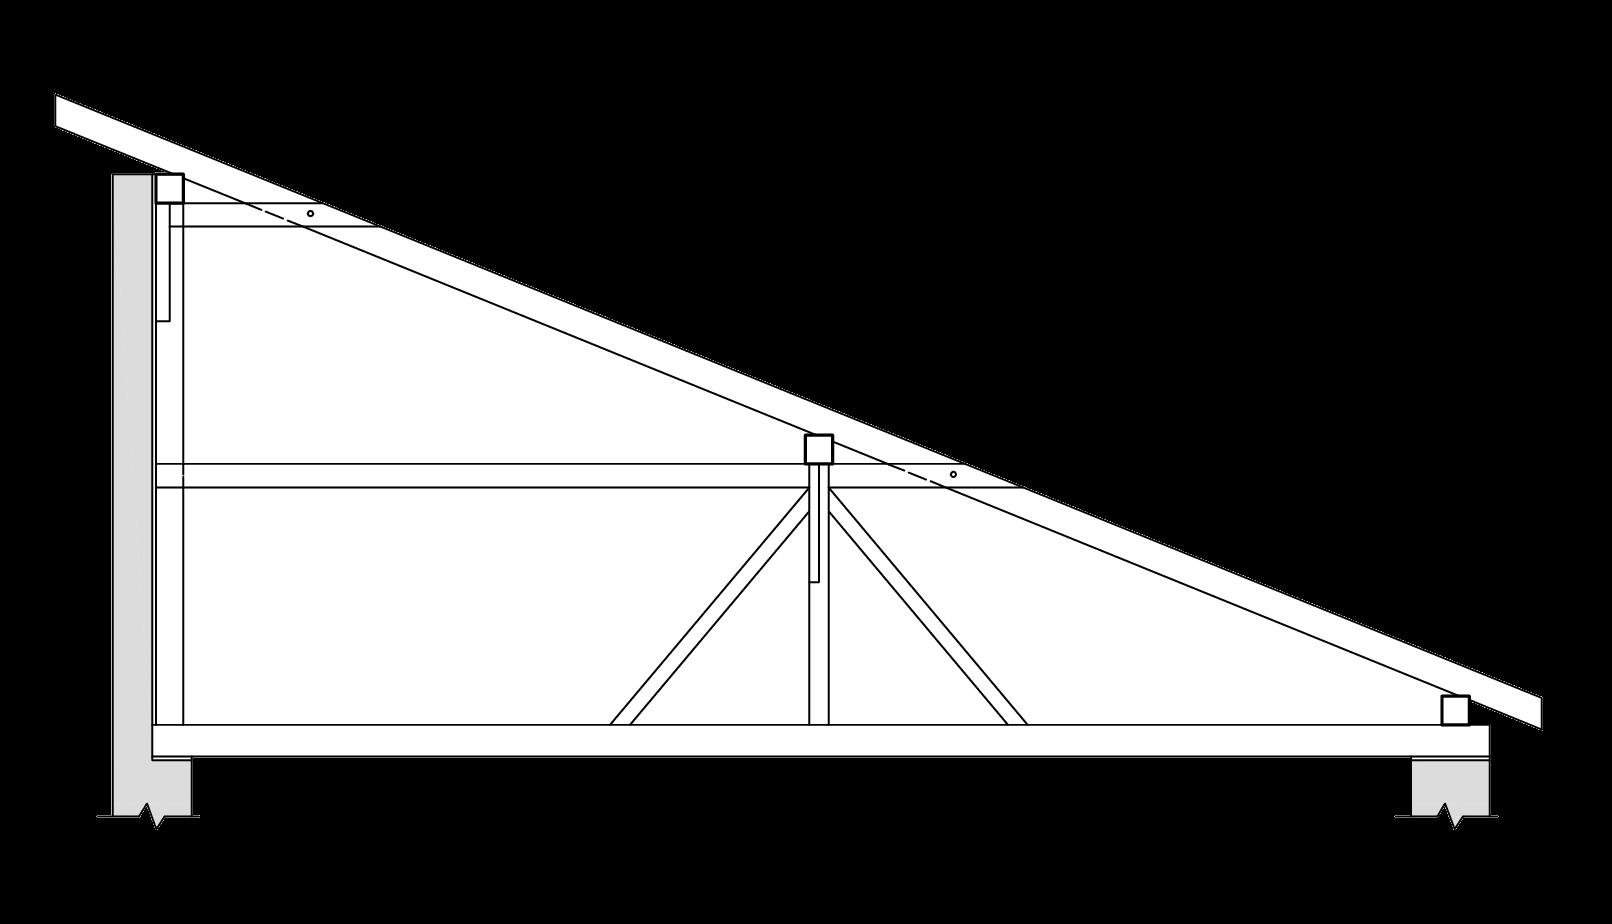 Stojata-stolica-v-pultovej-streche-nakres